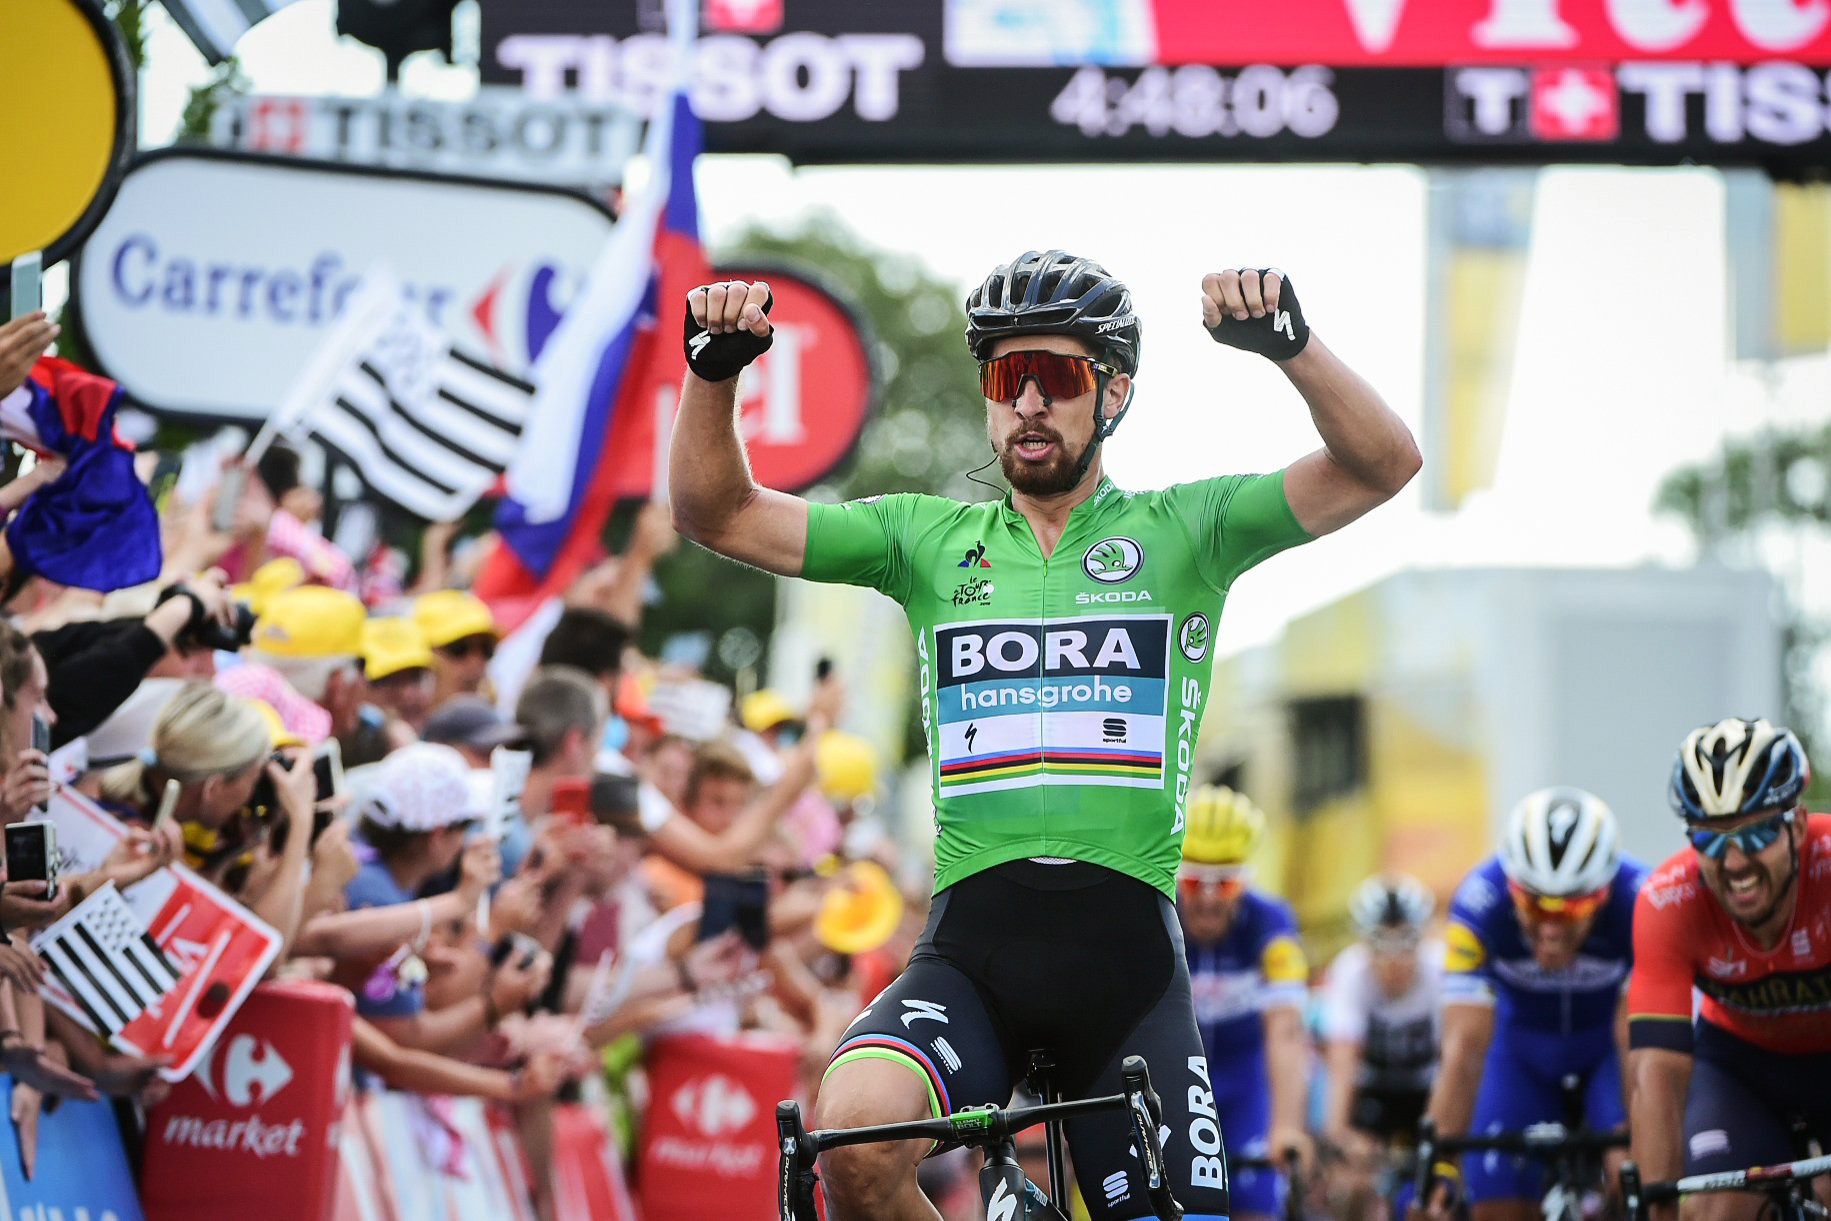 8138657f1d5c6 Sagan vyhral šiesty zelený dres na Tour de France a vyrovnal ...